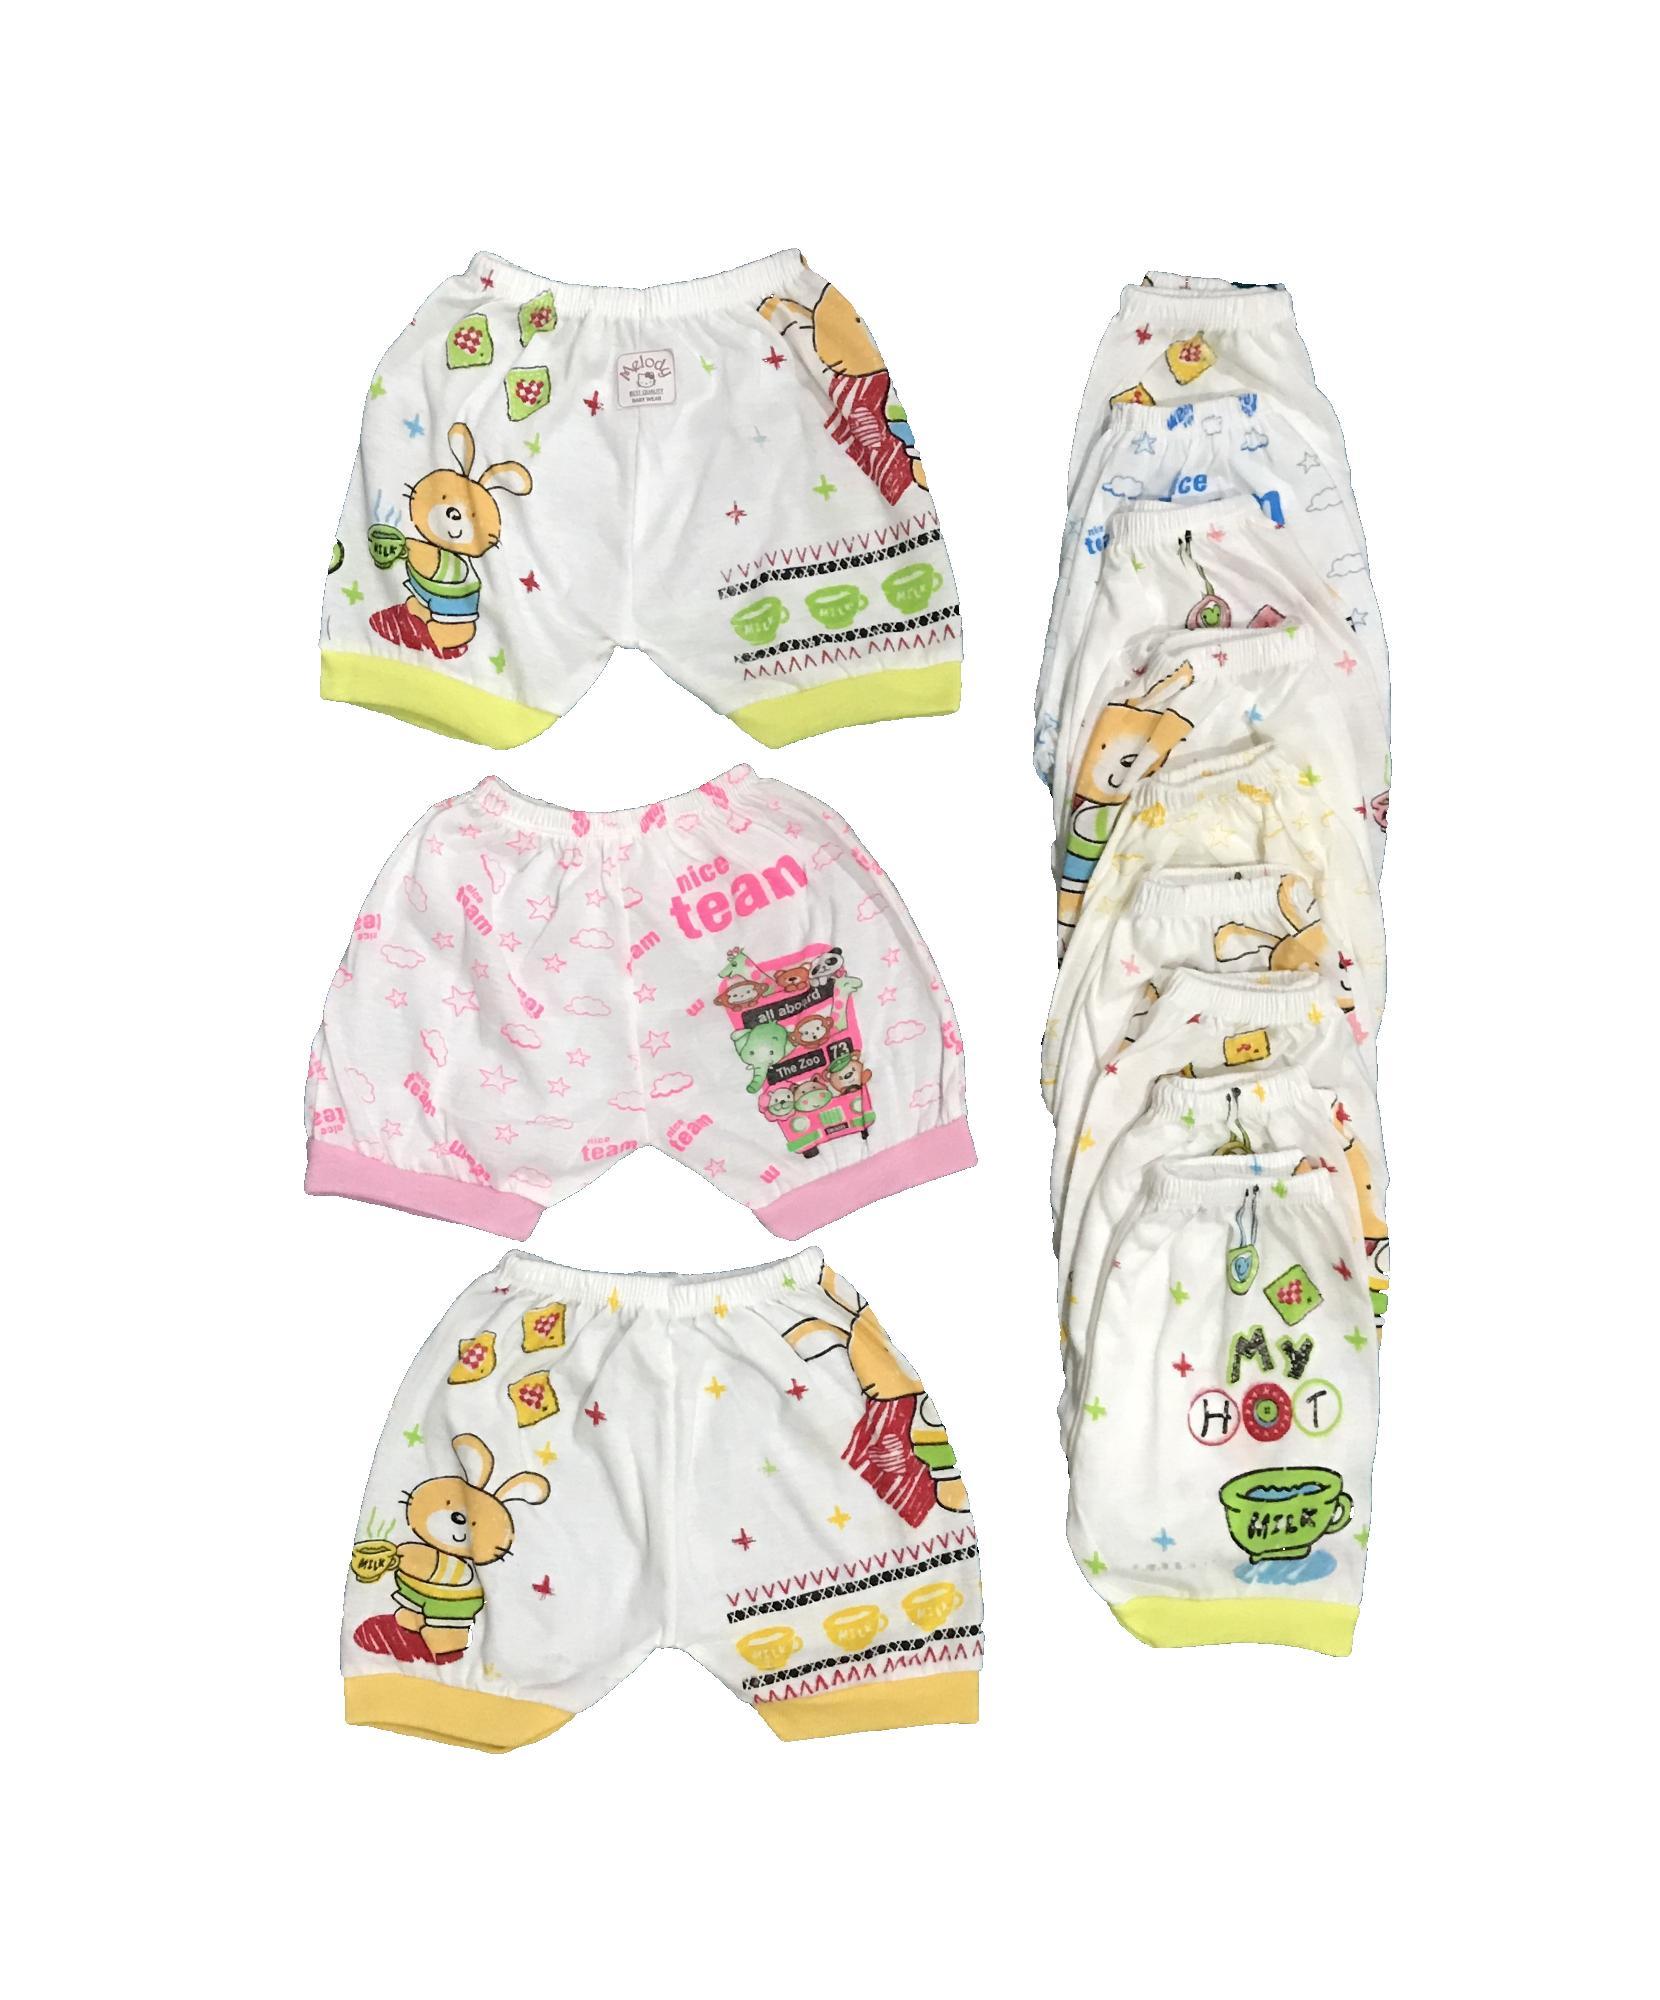 BAYIe - Celana pendek Bayi isi 12 pcs MELODY umur 0-12 bulan/celana santai/celana rumah/anak laki-laki/anak perempuan